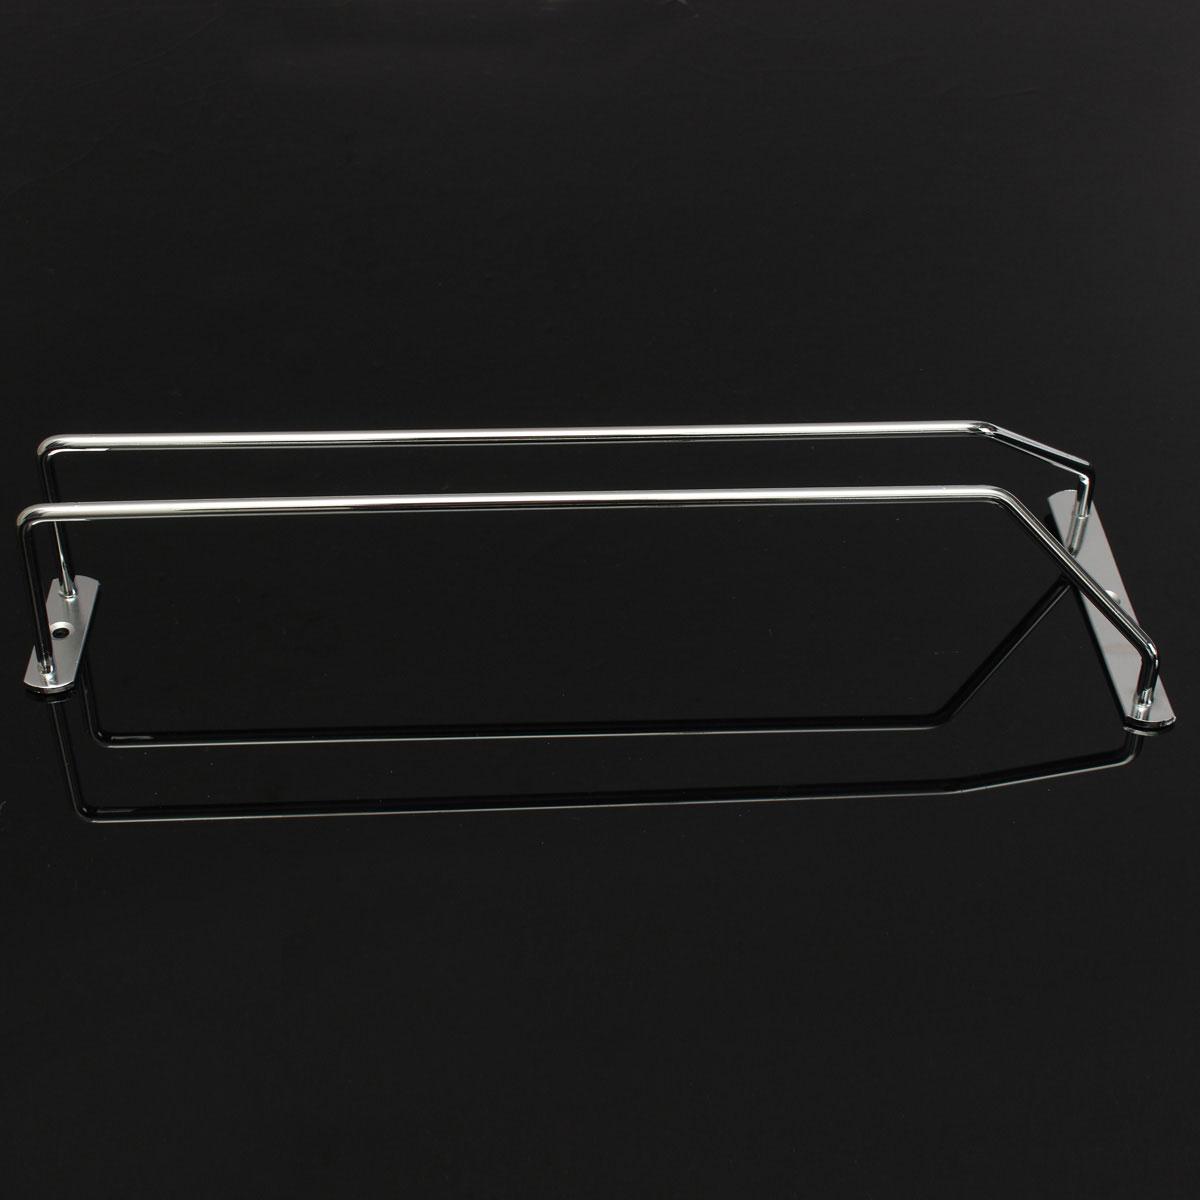 1 range support rangement verres pied fl tes porte verres chrome etag res 35cm ebay. Black Bedroom Furniture Sets. Home Design Ideas